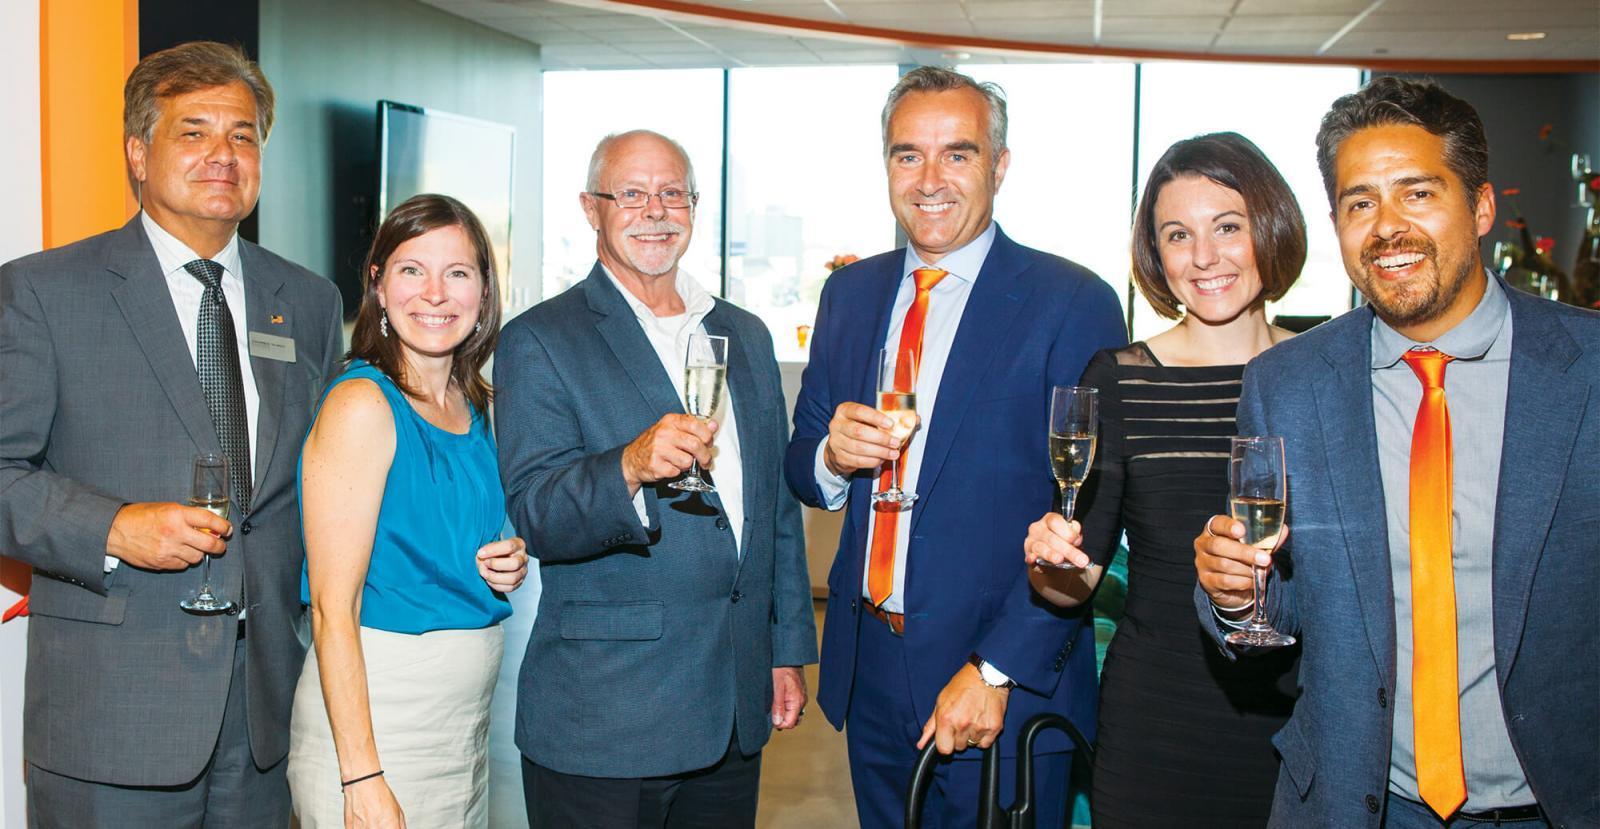 Dümmen Orange opens new North American headquarters